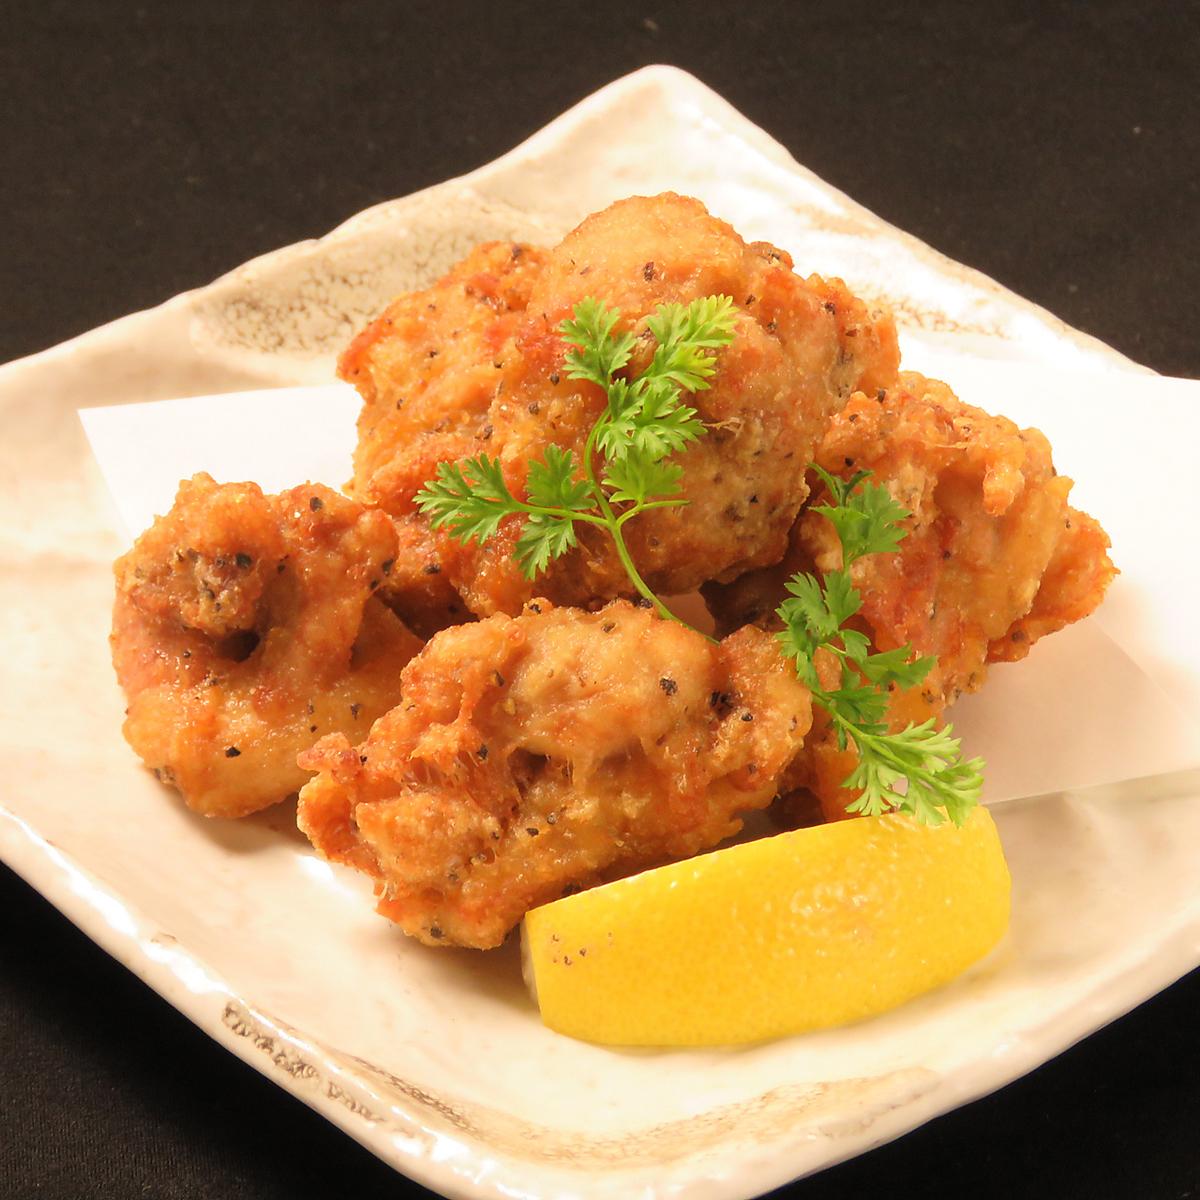 Deep-fried chicken thigh juicy